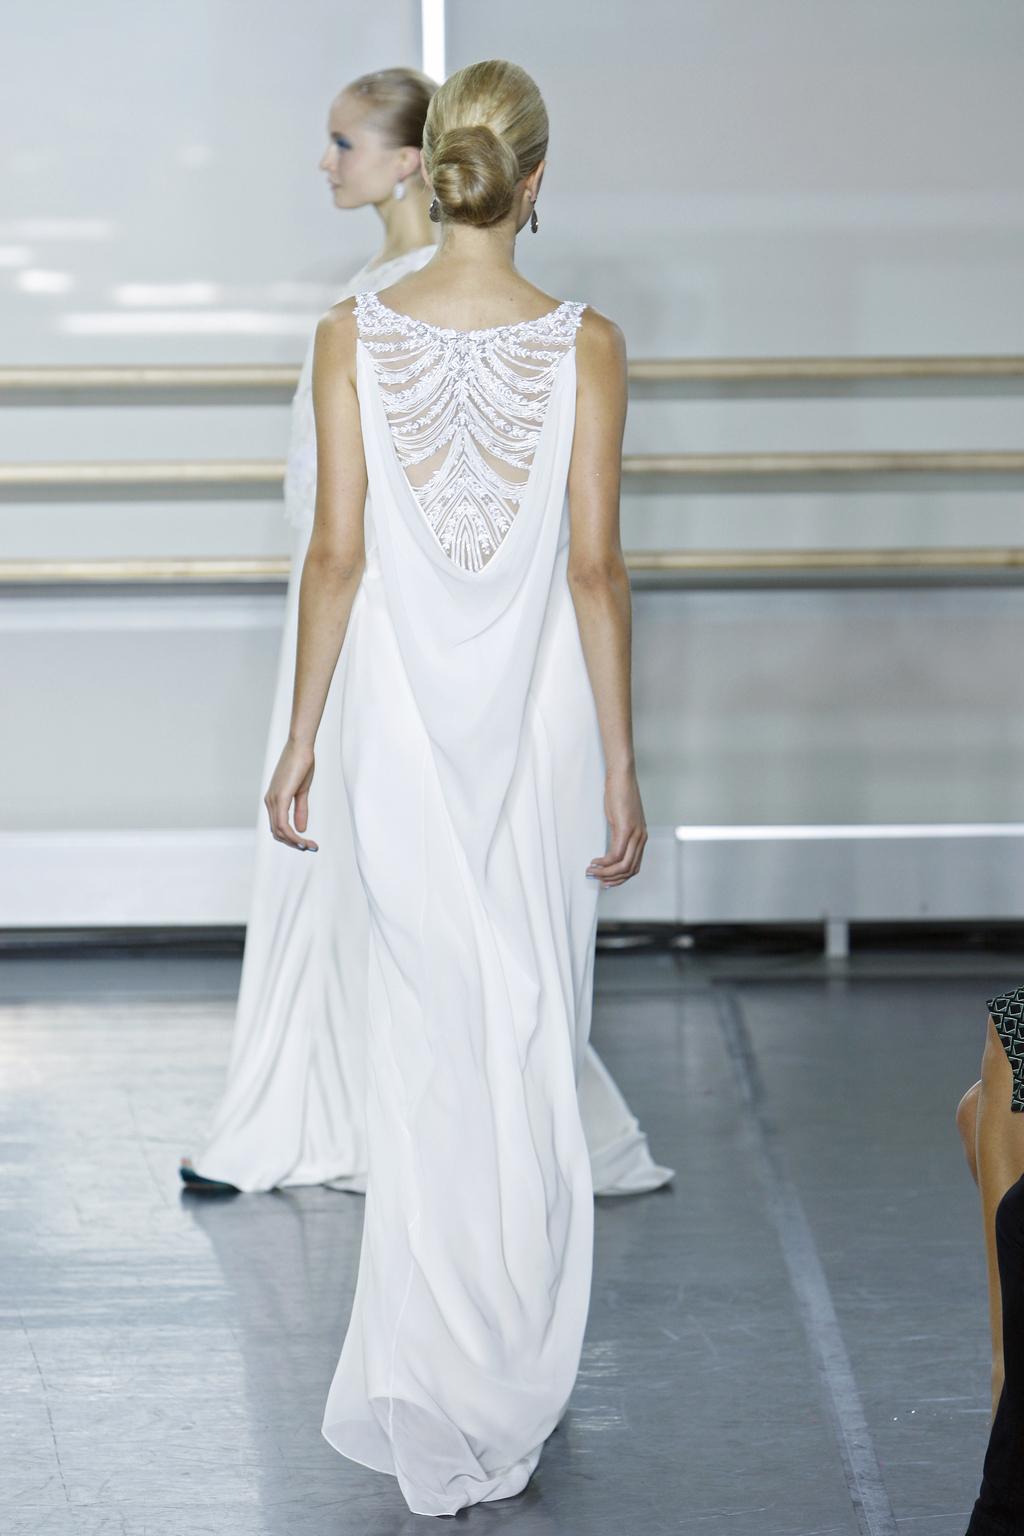 Rivini-wedding-dress-fall-2013-bridal-gown-nova-back.full